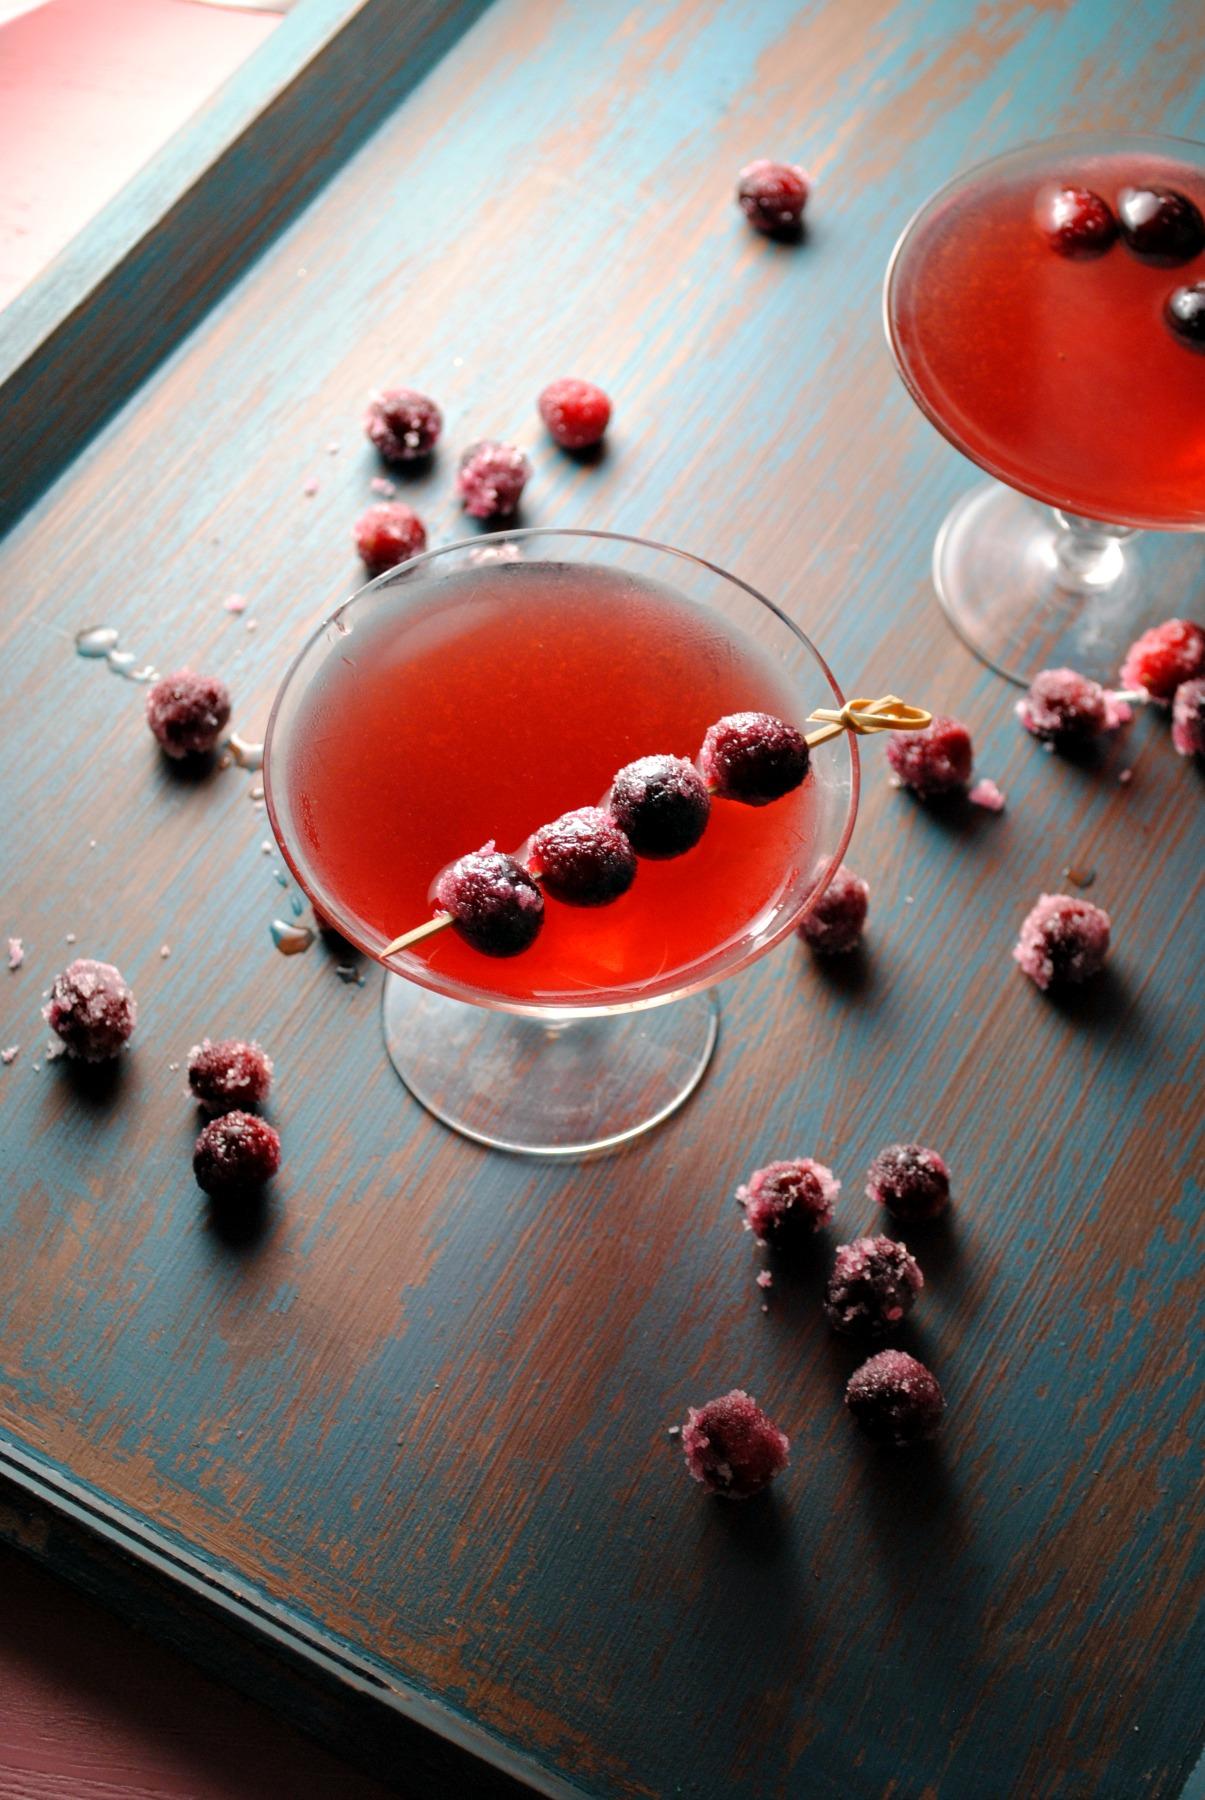 chipotle-cranberry-VianneyRodriguez-tabasco